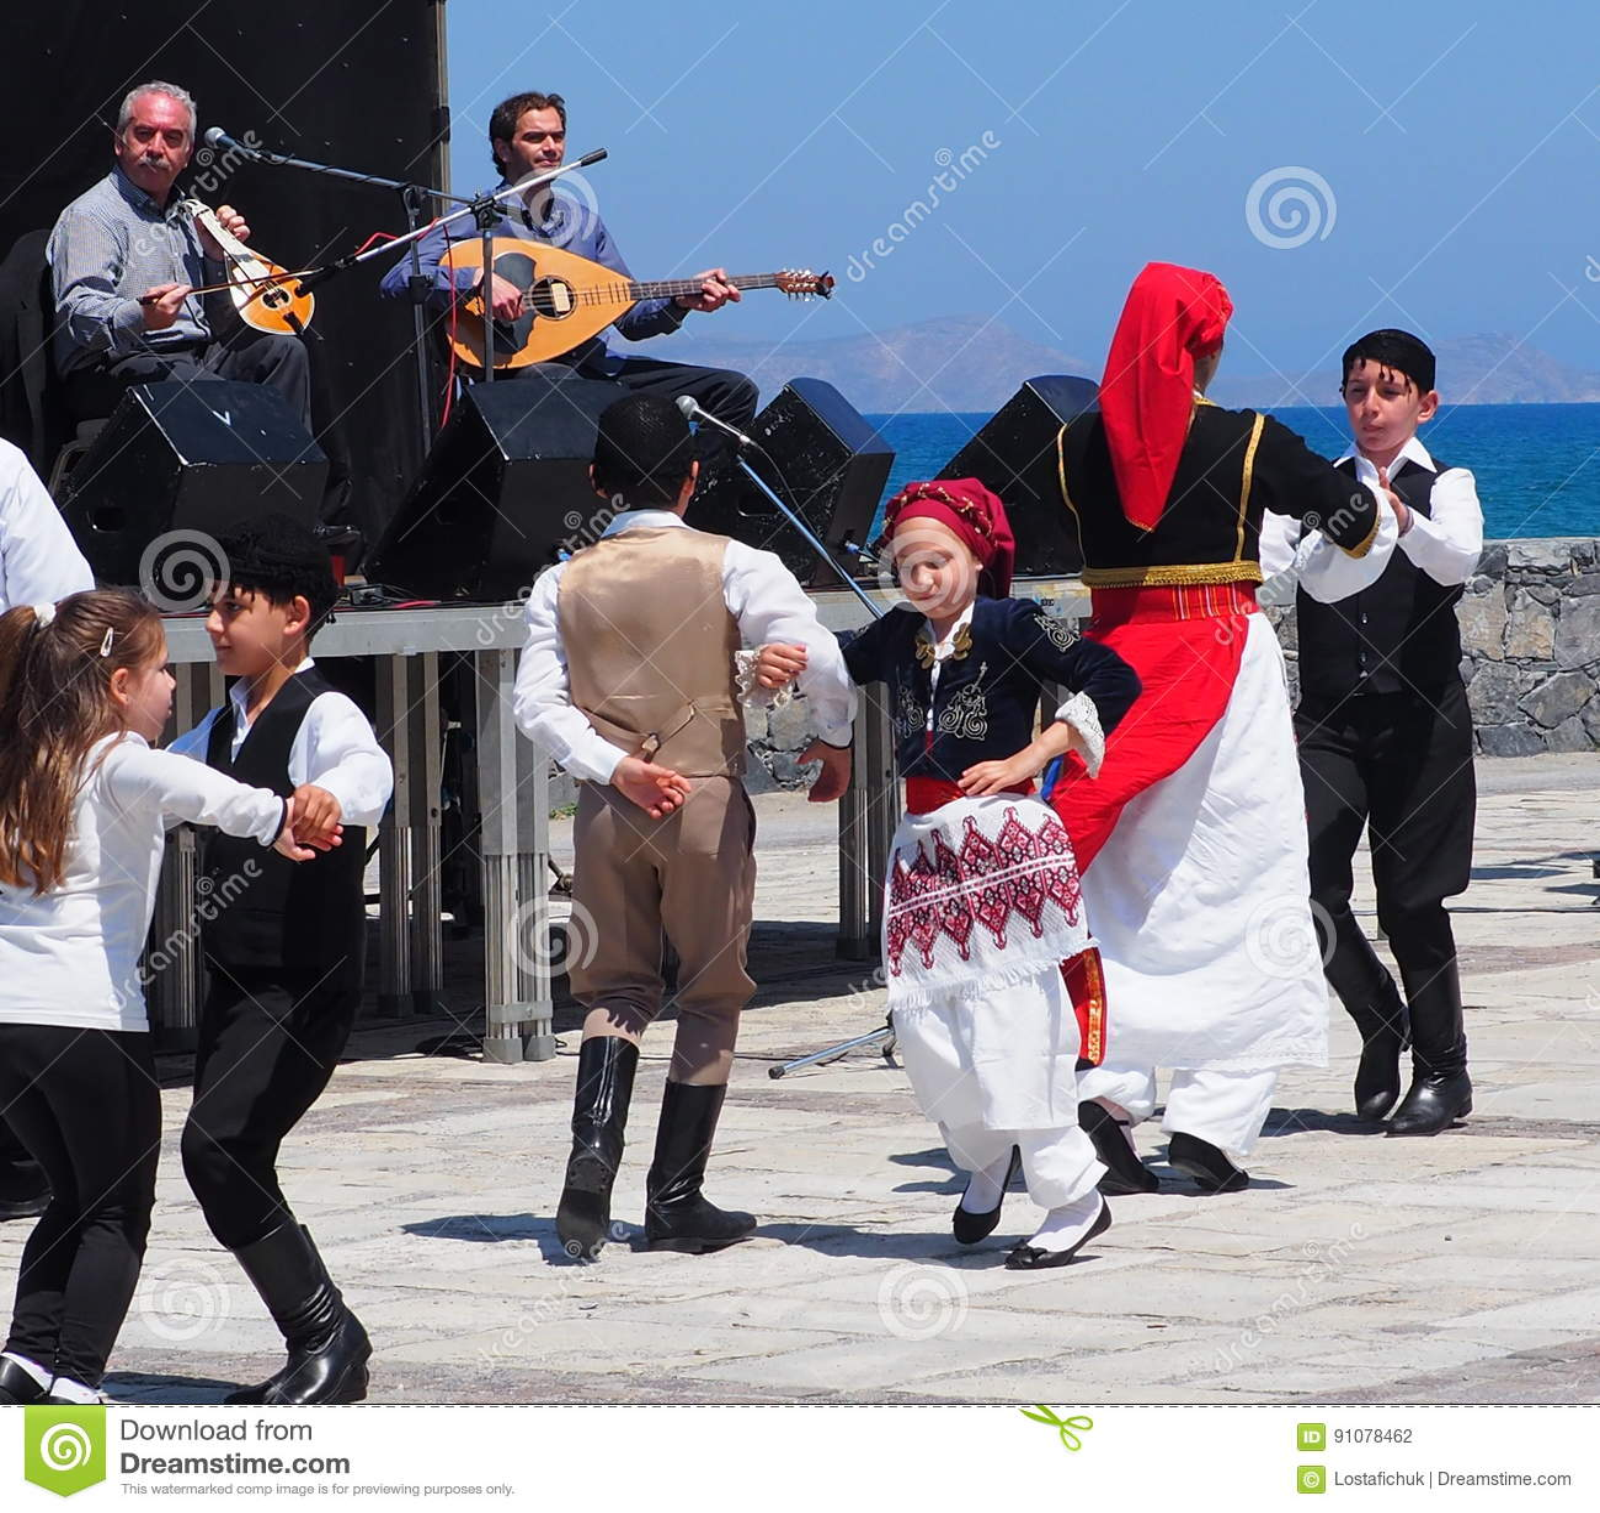 5a4989947dcb Χορευτές στον εορτασμό Ηράκλειο Κρήτη Ελλάδα Πάσχας Εκδοτική ...